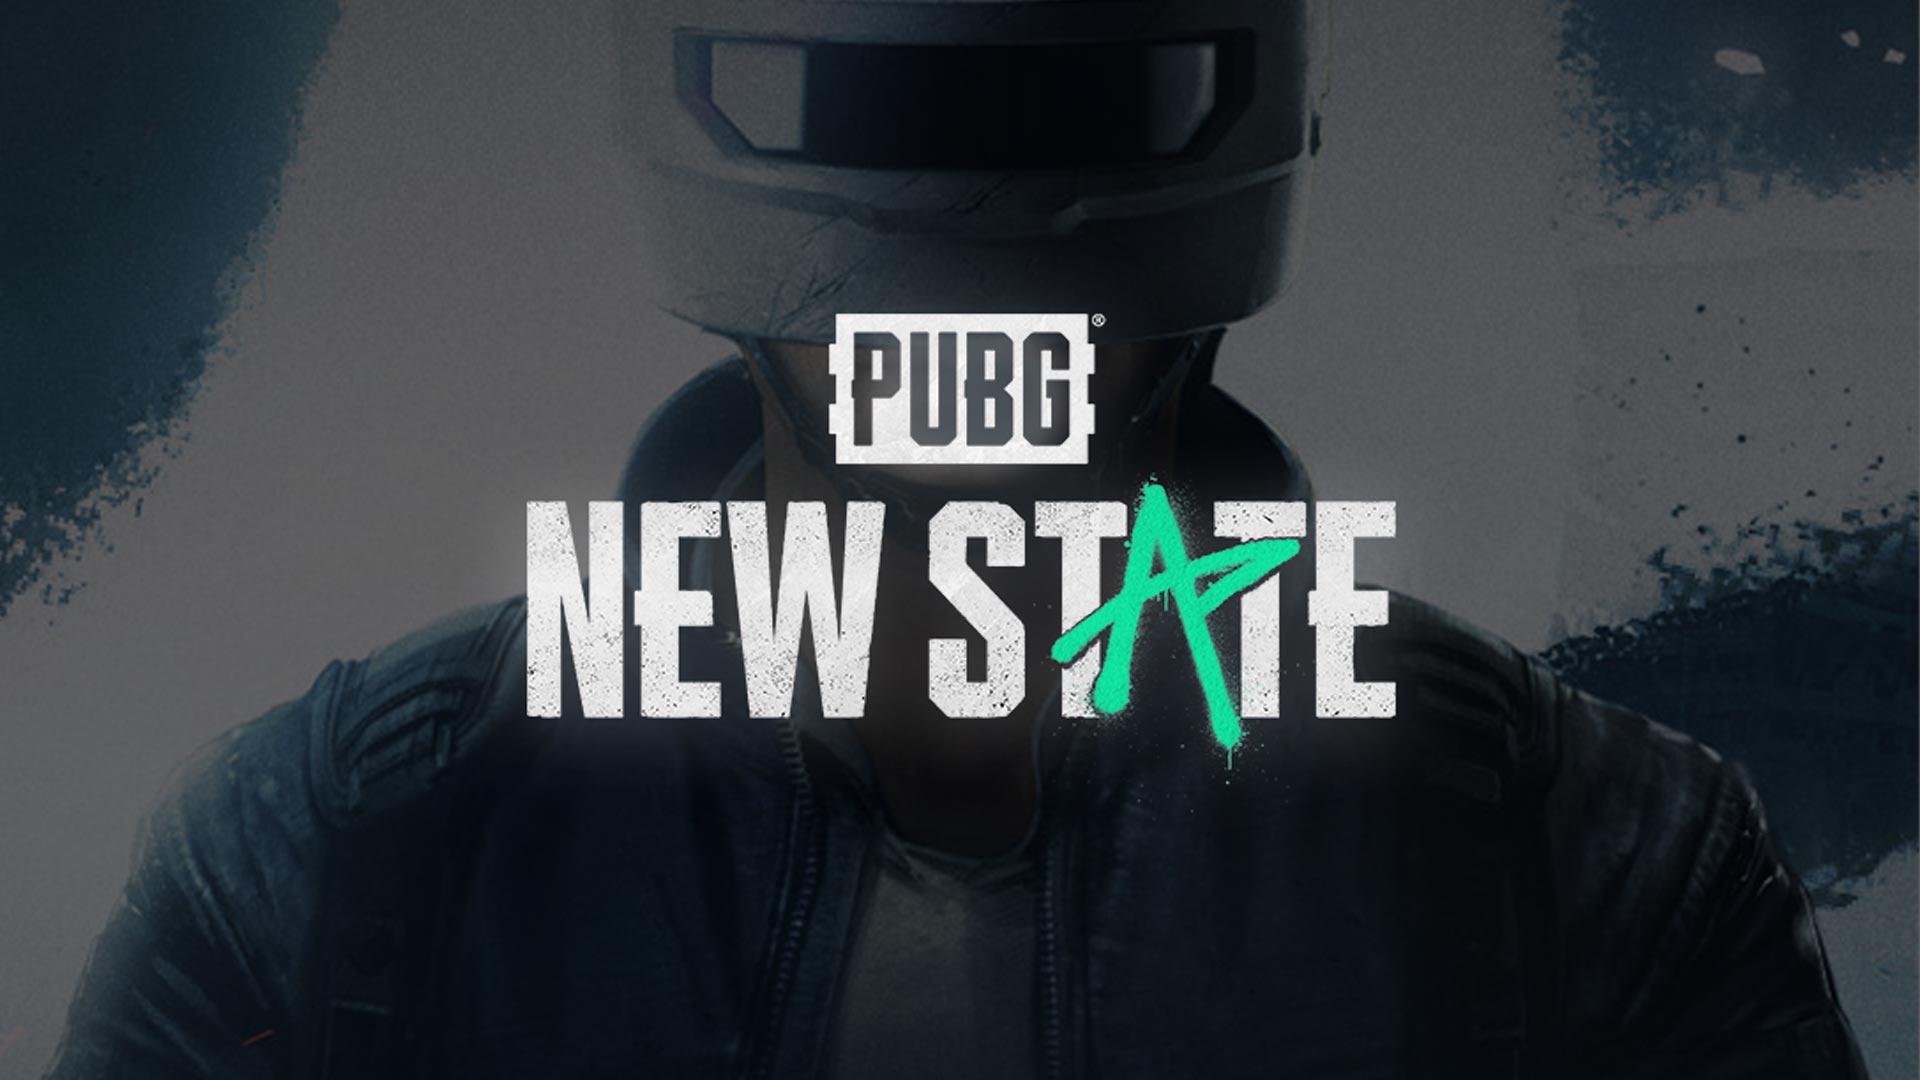 Постер PUBG: New State